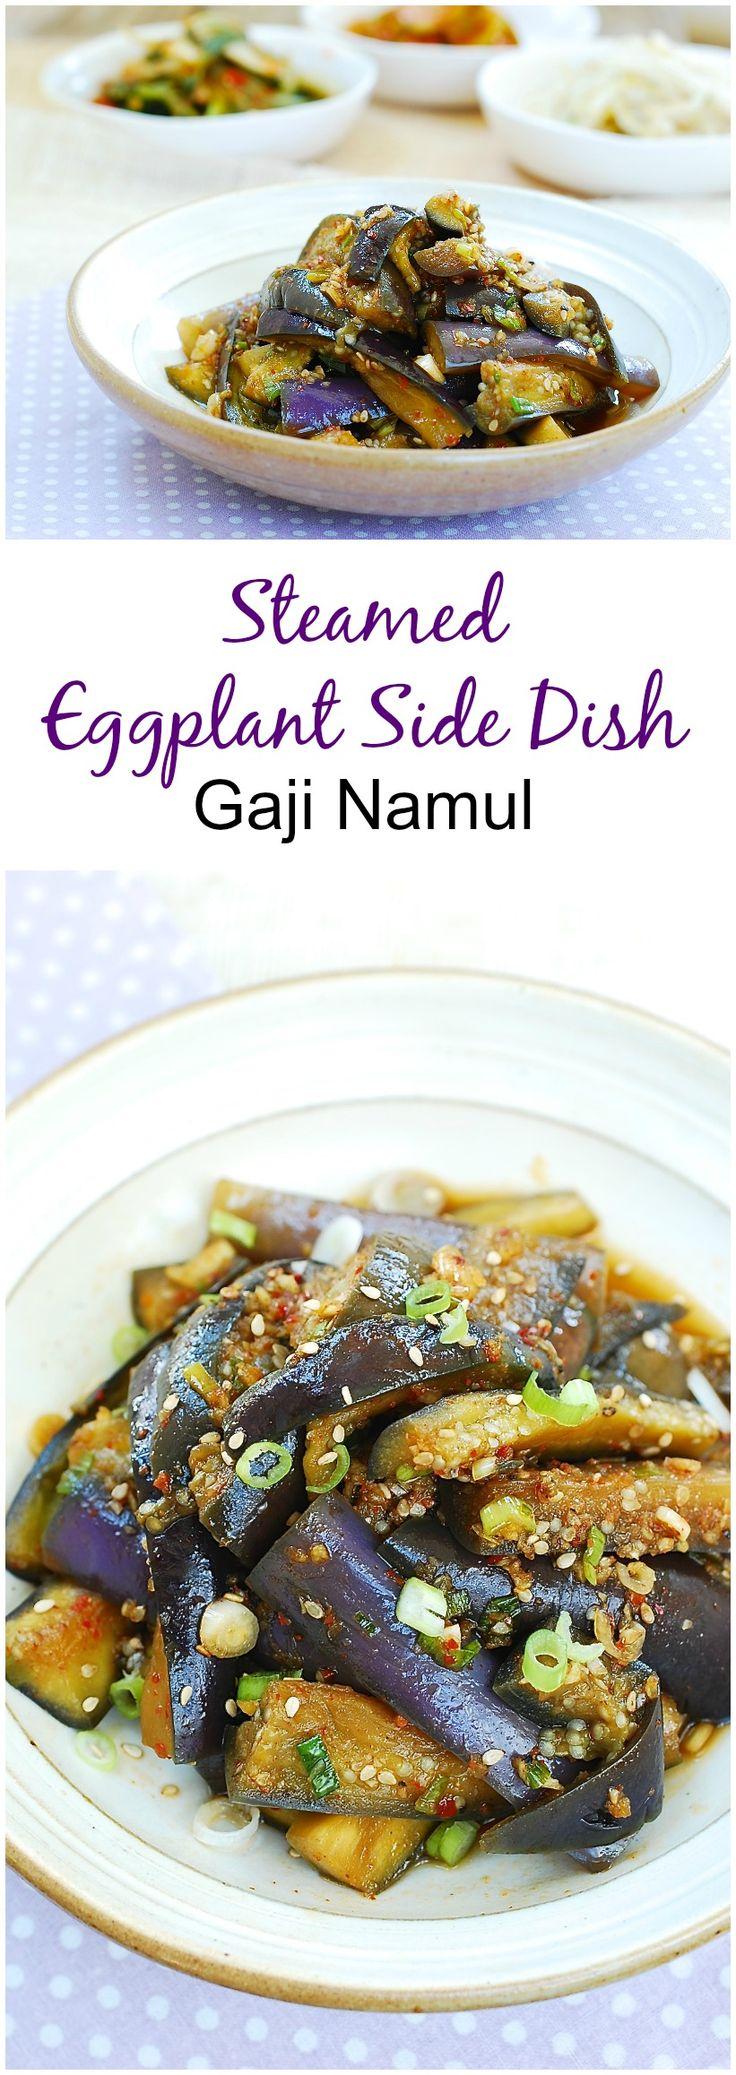 Delicious Korean eggplant side dish!